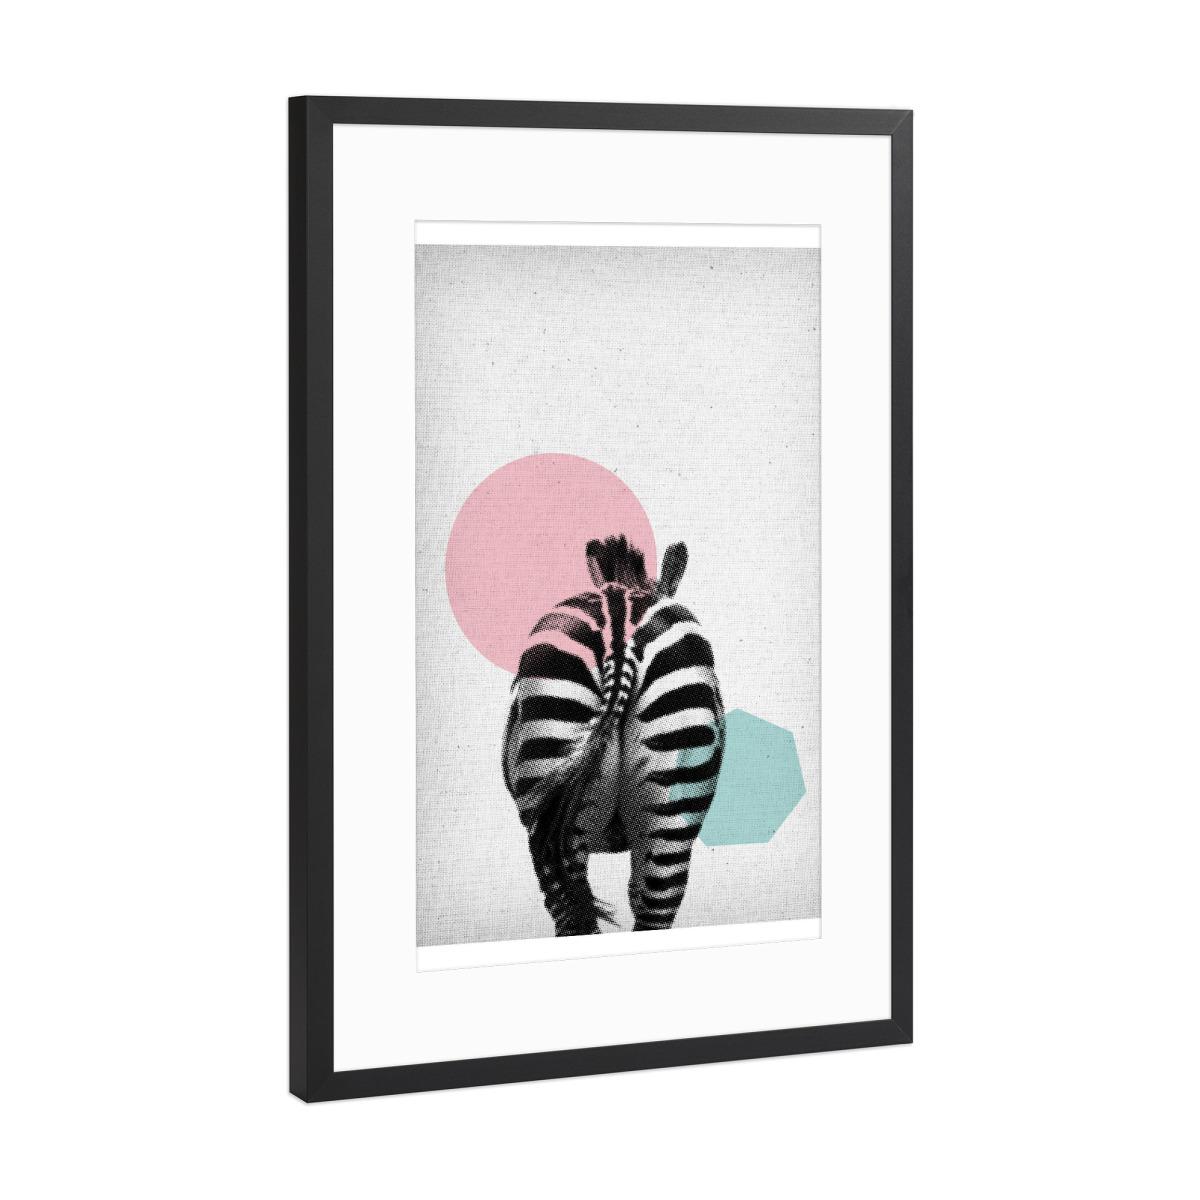 Zebra 01 als Gerahmt bei artboxONE kaufen